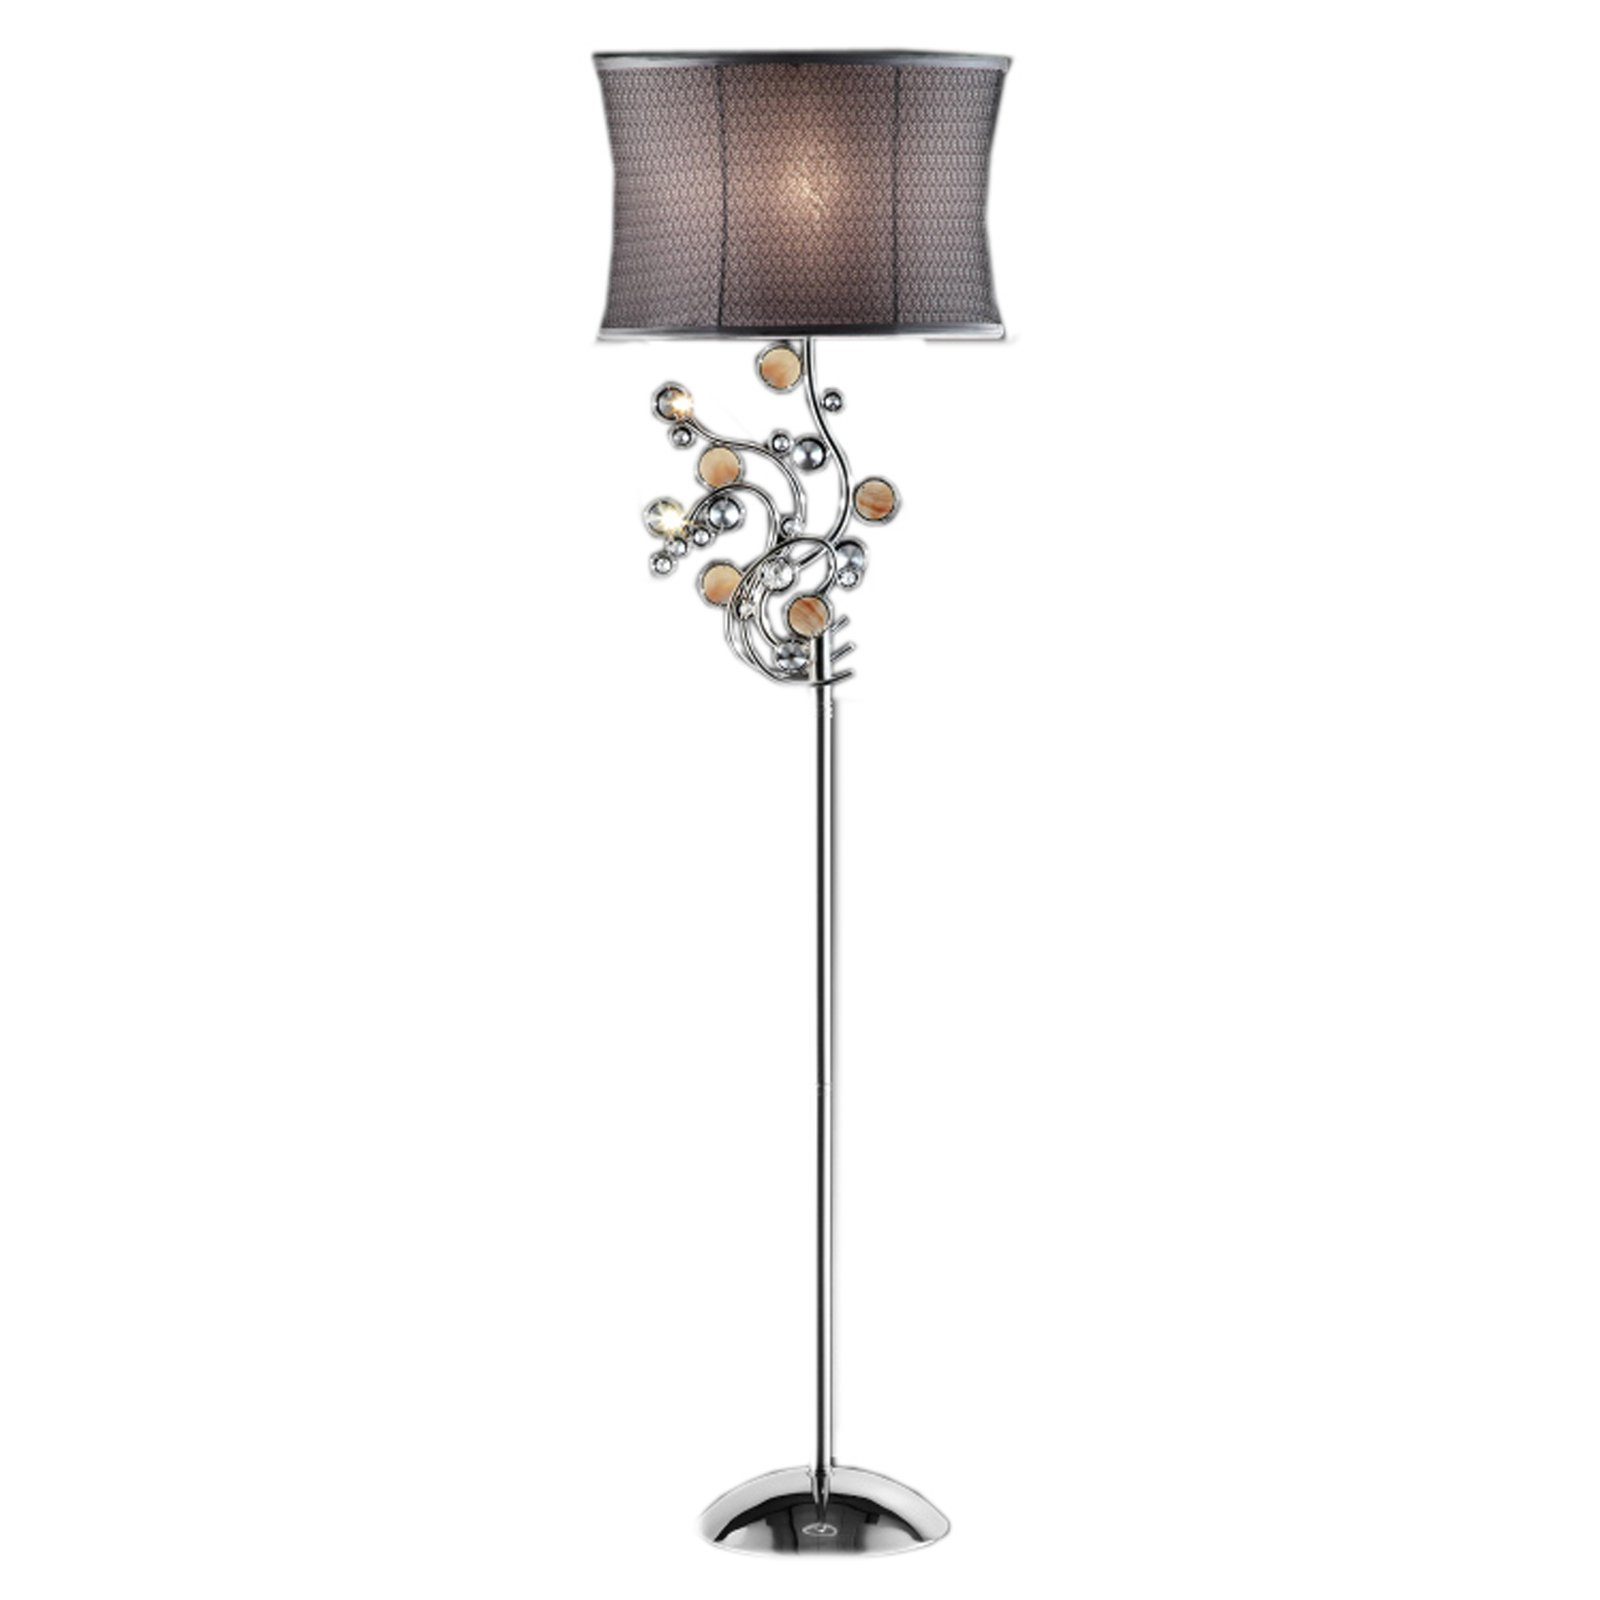 ore international floor lamp photo - 8